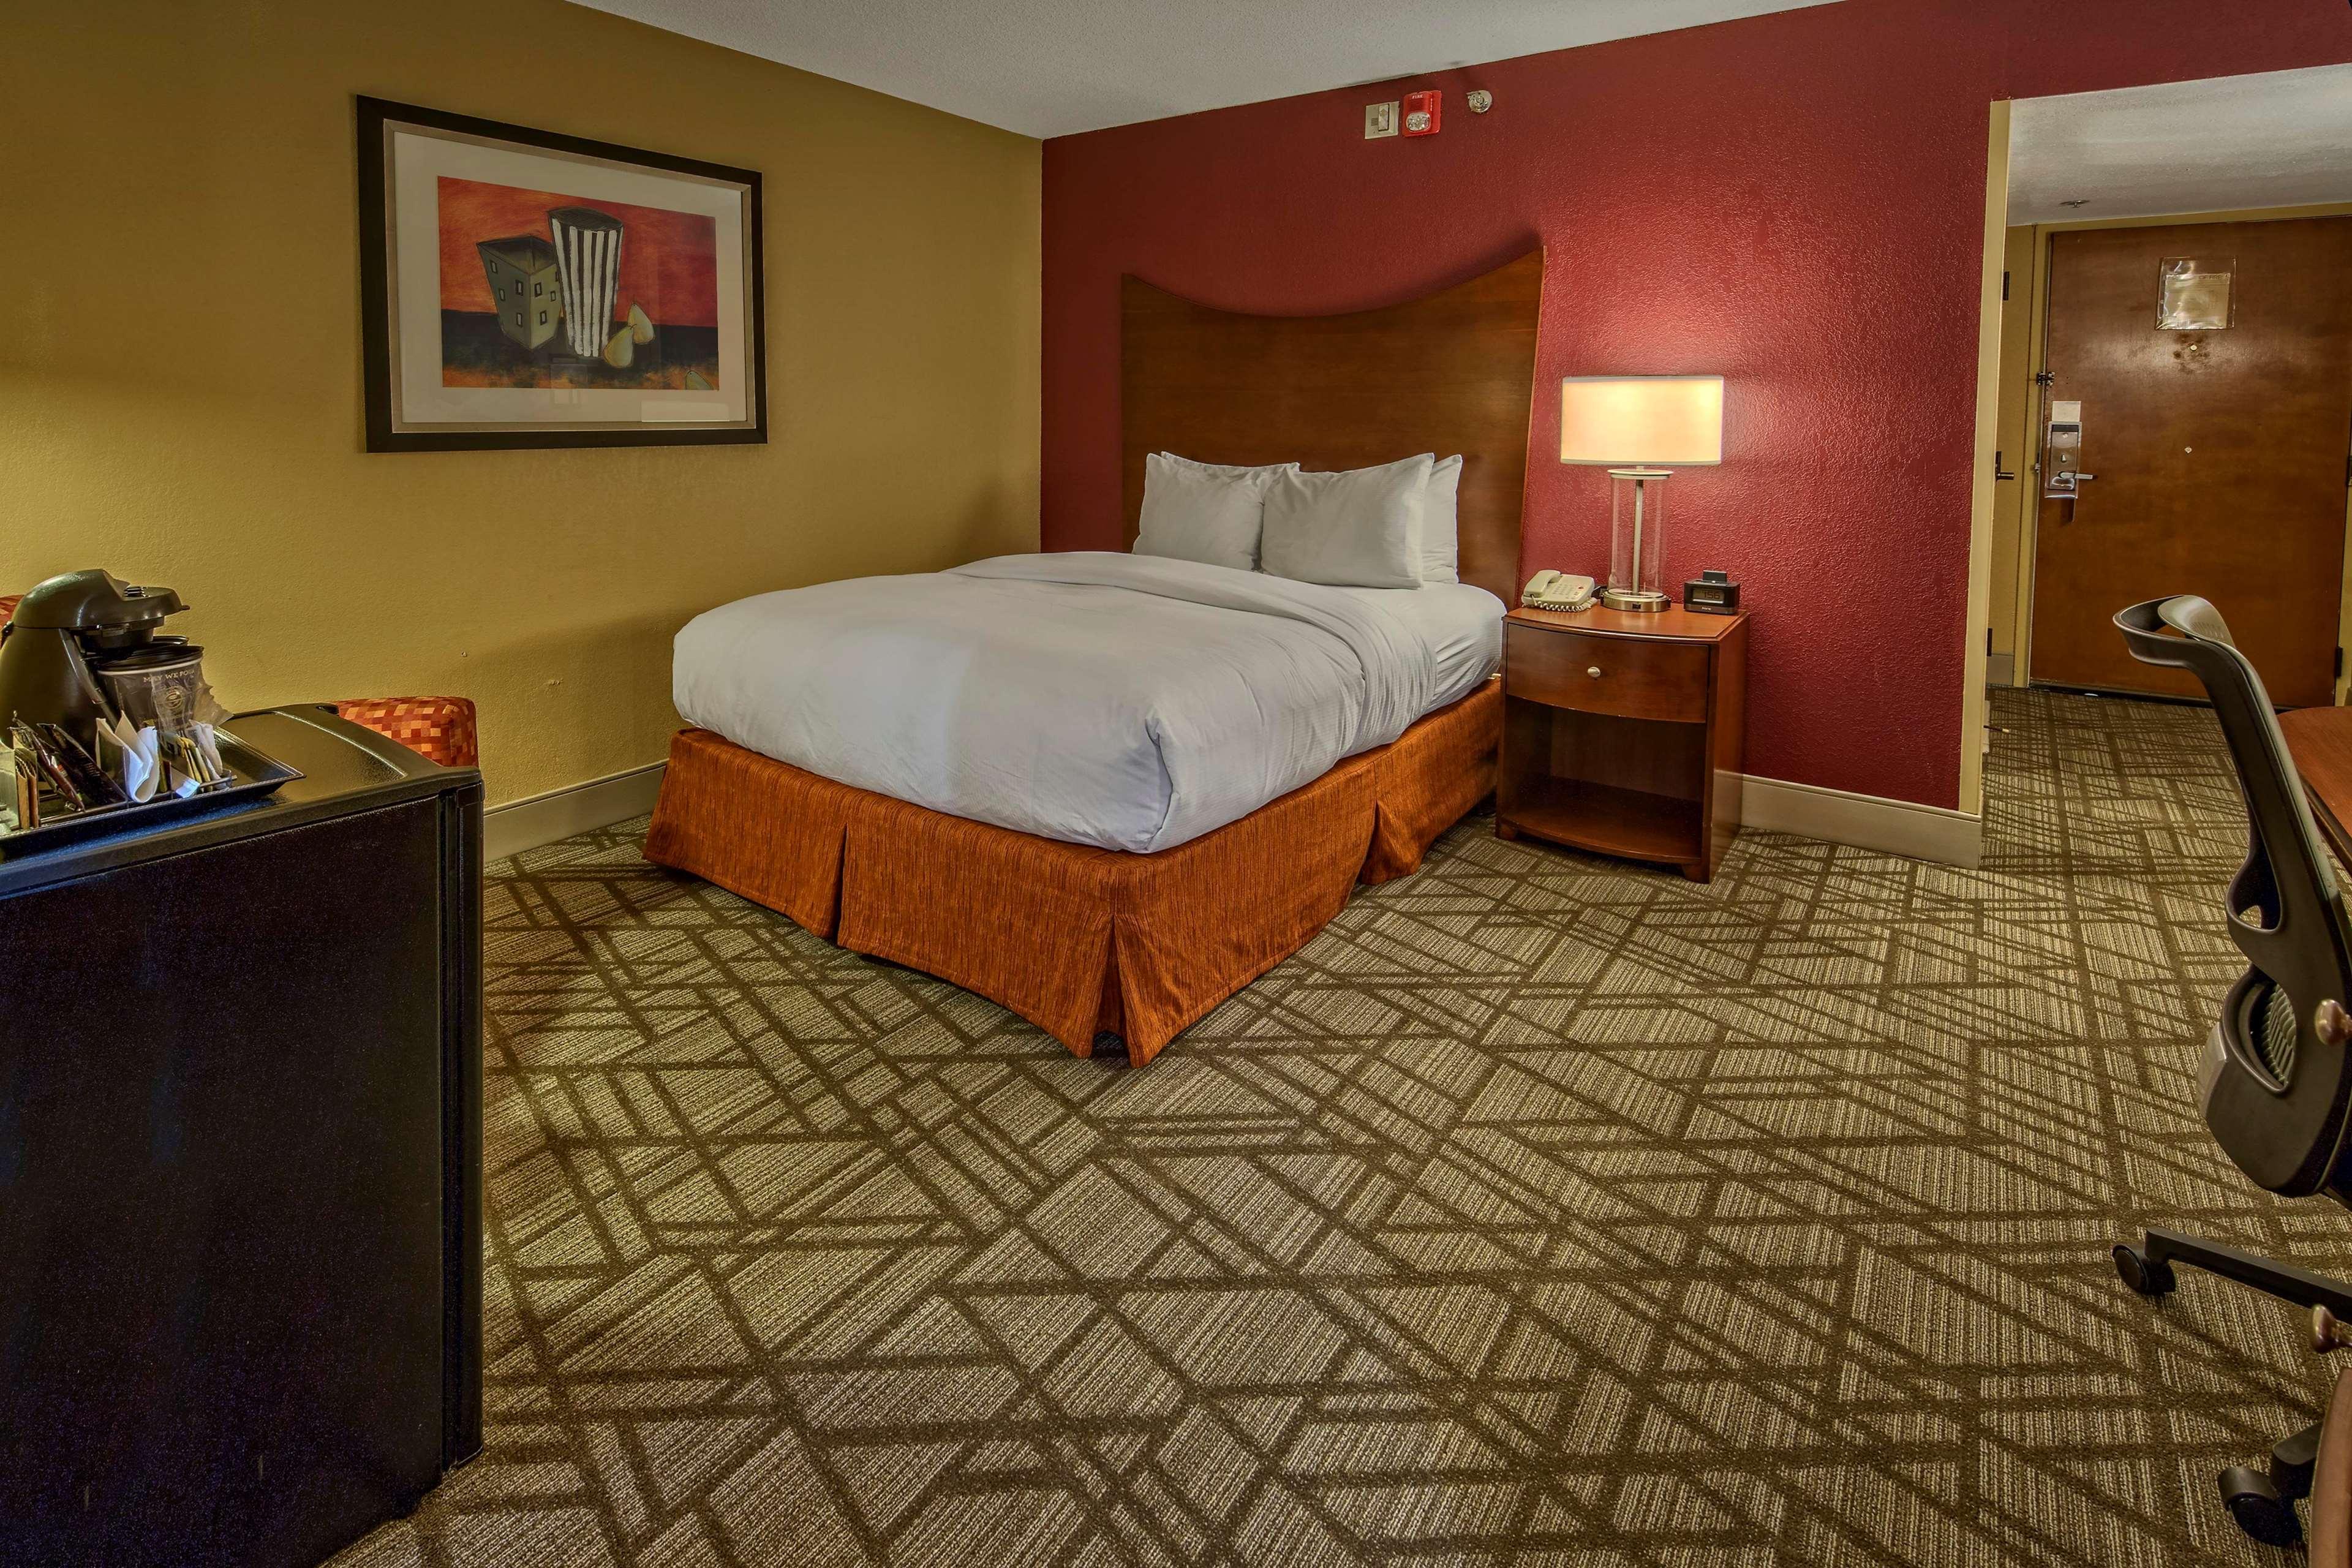 DoubleTree by Hilton Hotel Oak Ridge - Knoxville image 35